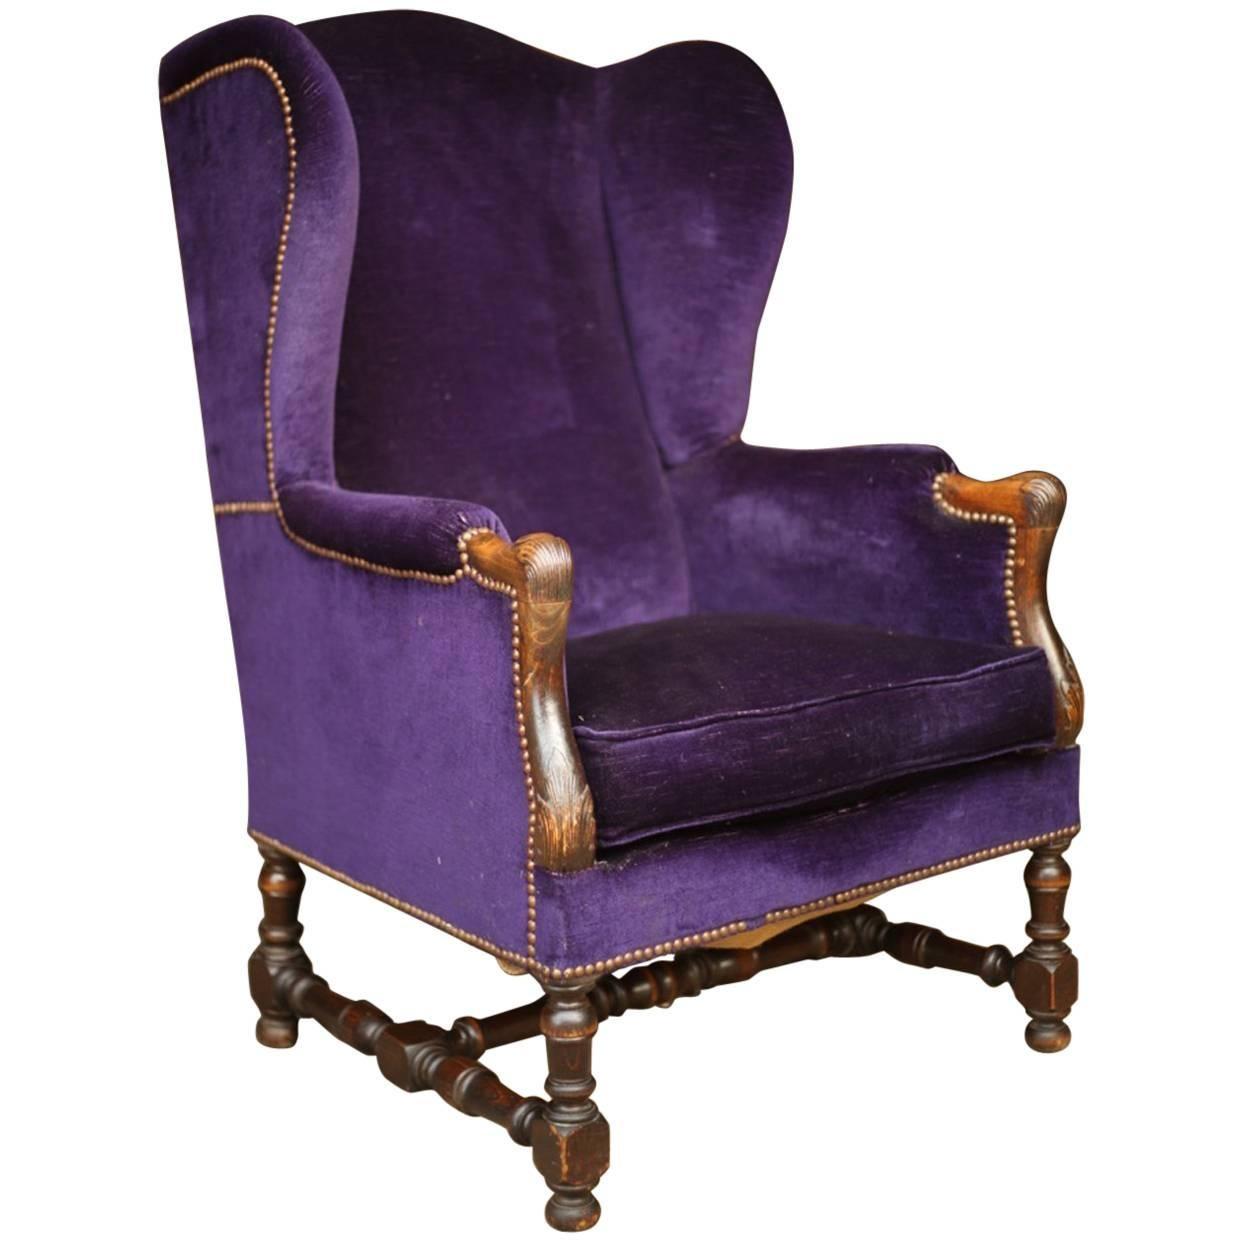 19th Century Wingback Armchair in Purple Velvet at 1stdibs